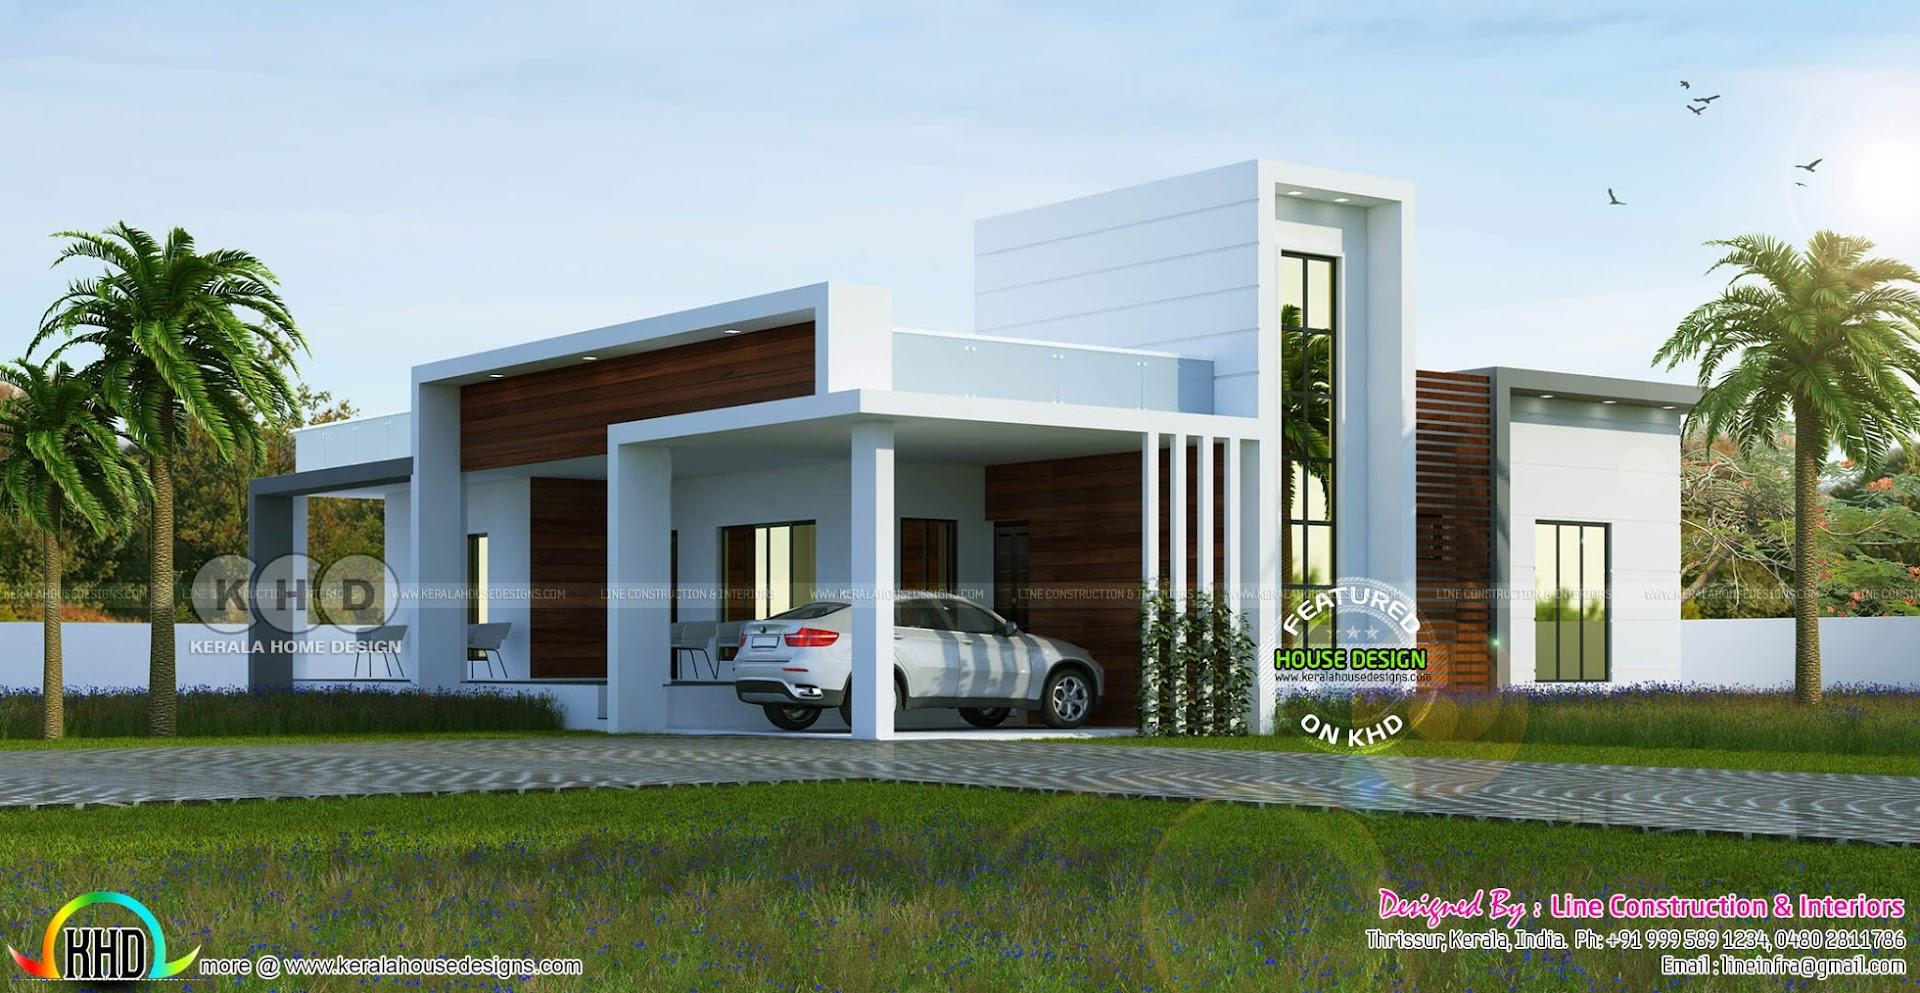 1255 sq ft 4 bedroom flat roof box model home